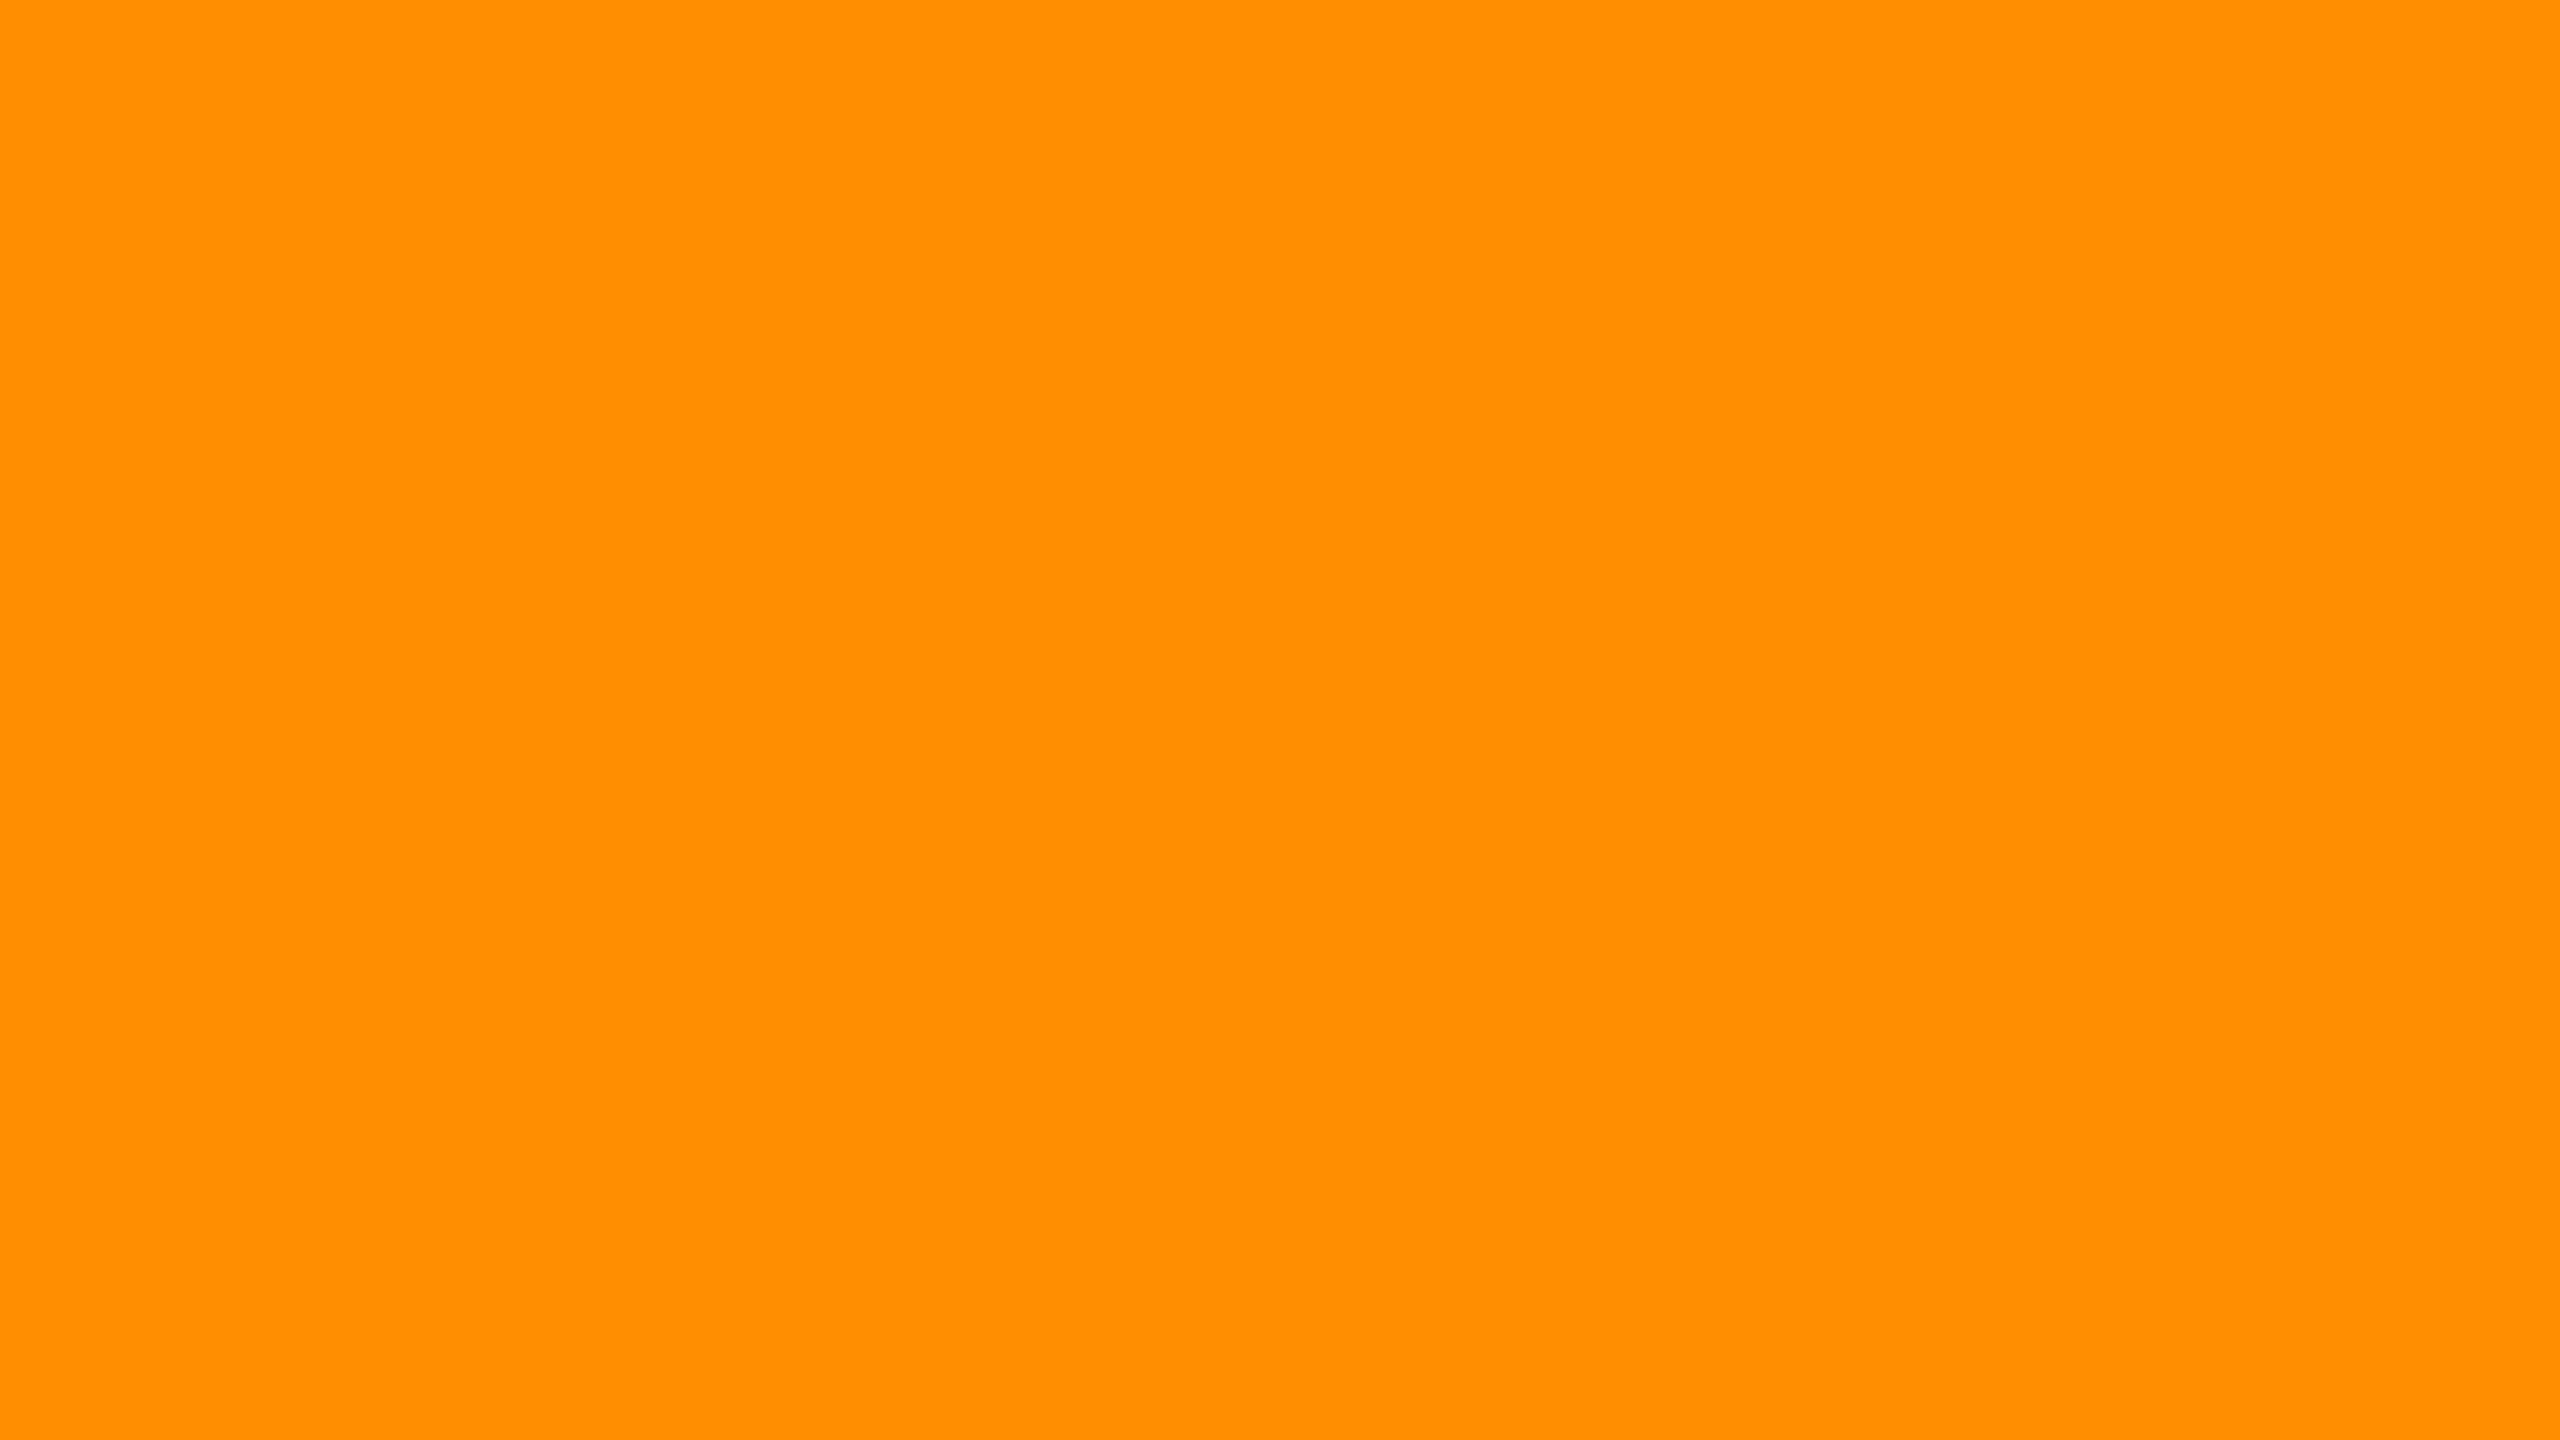 2560x1440 Princeton Orange Solid Color Background